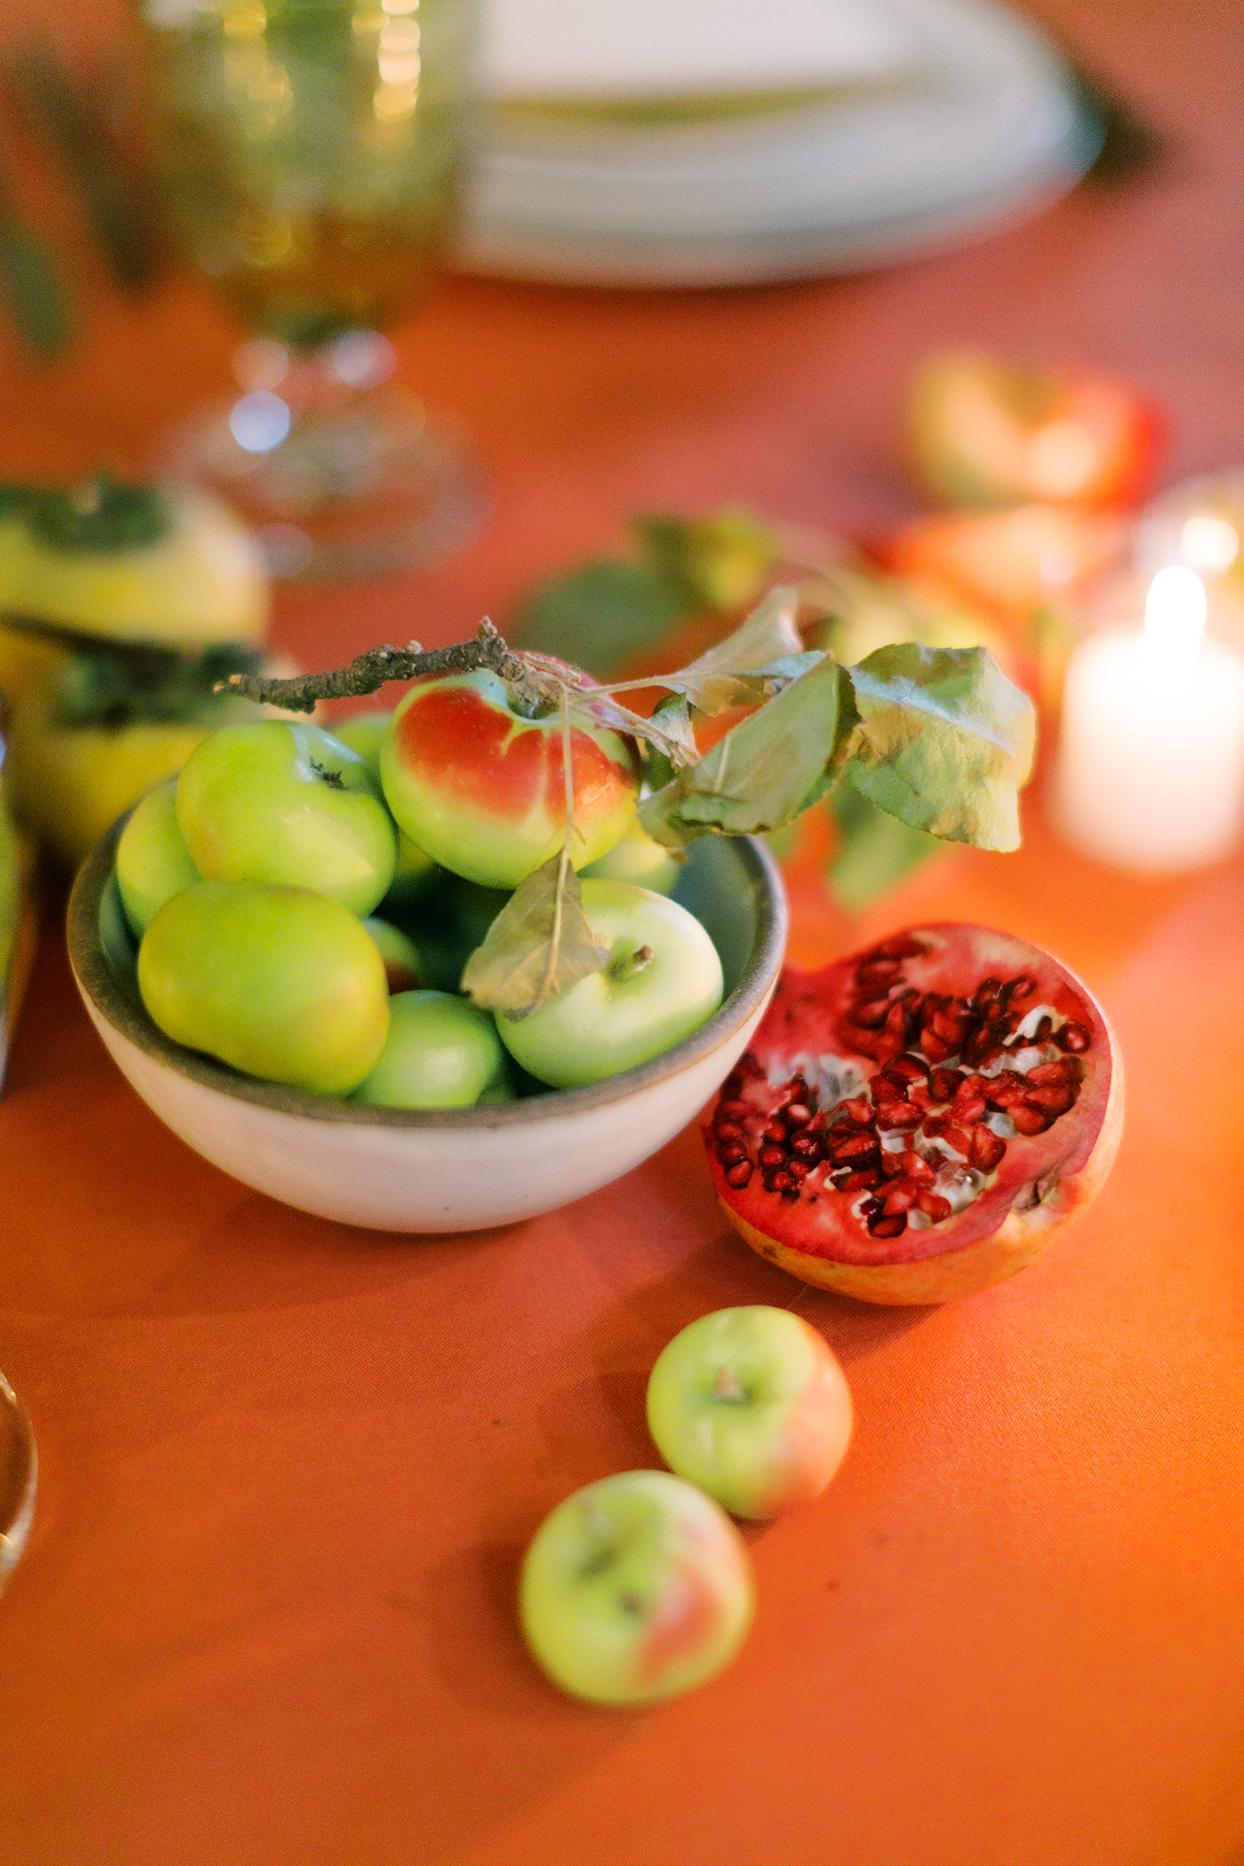 wedding reception decorative fruit on orange table cloth